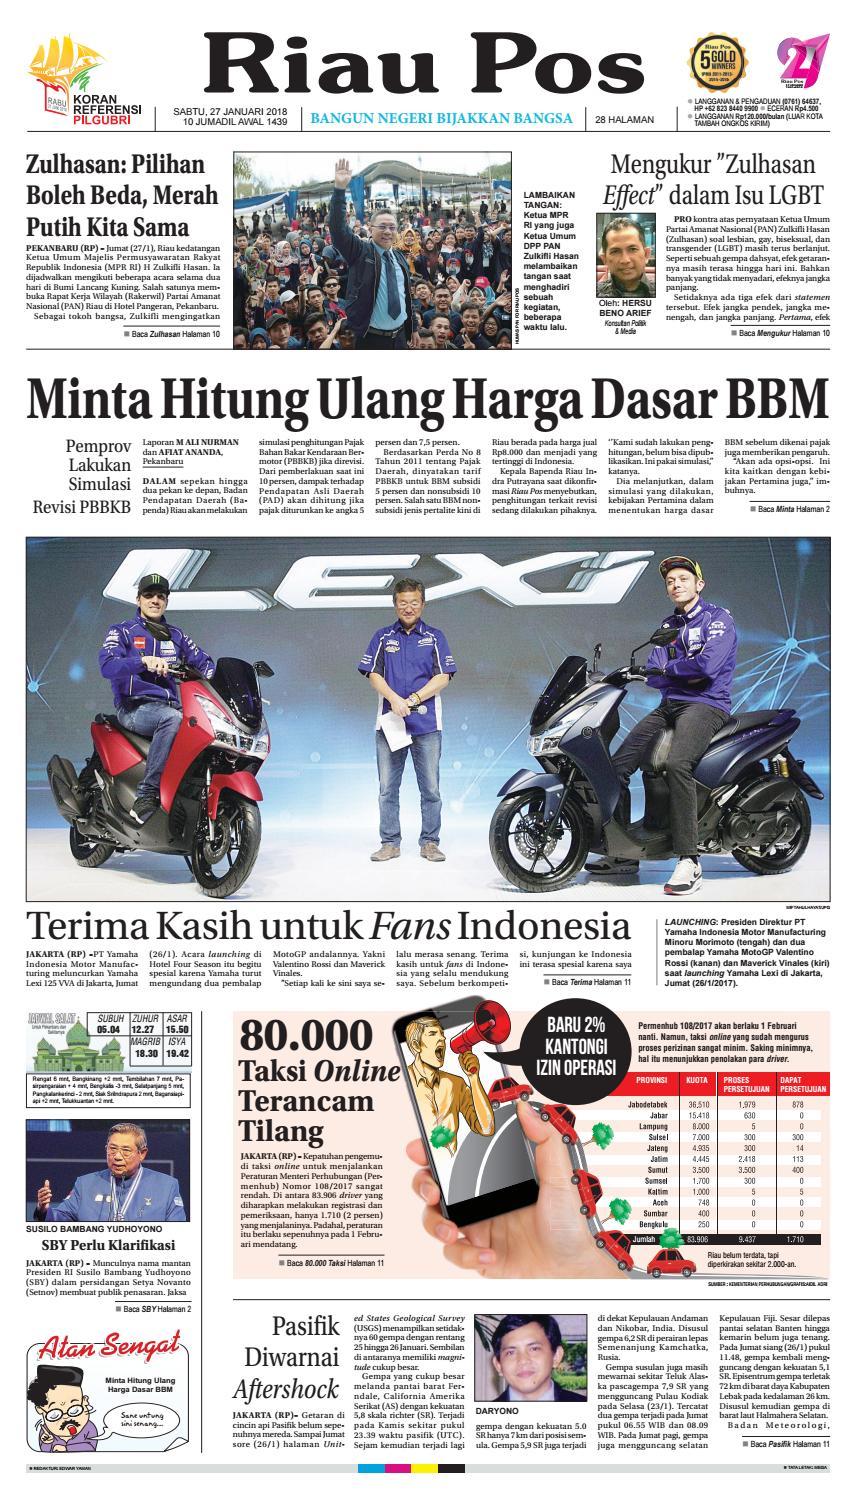 2018 01 27 By Riau Pos Issuu Rejeki Anak Soleh Mamypoko Standar M34